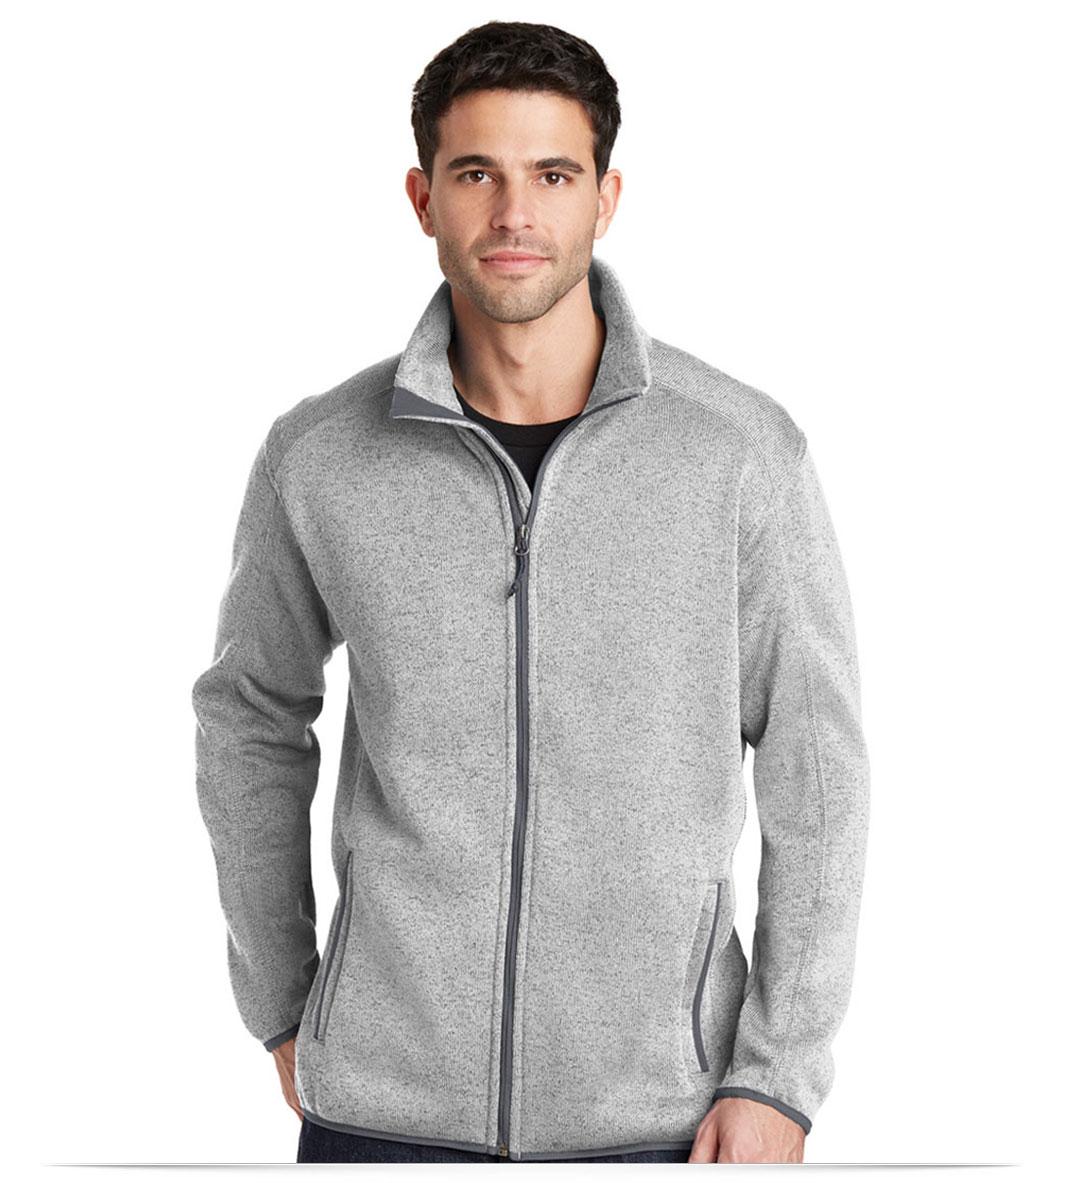 Sweater Fleece Jacket Customize Logo